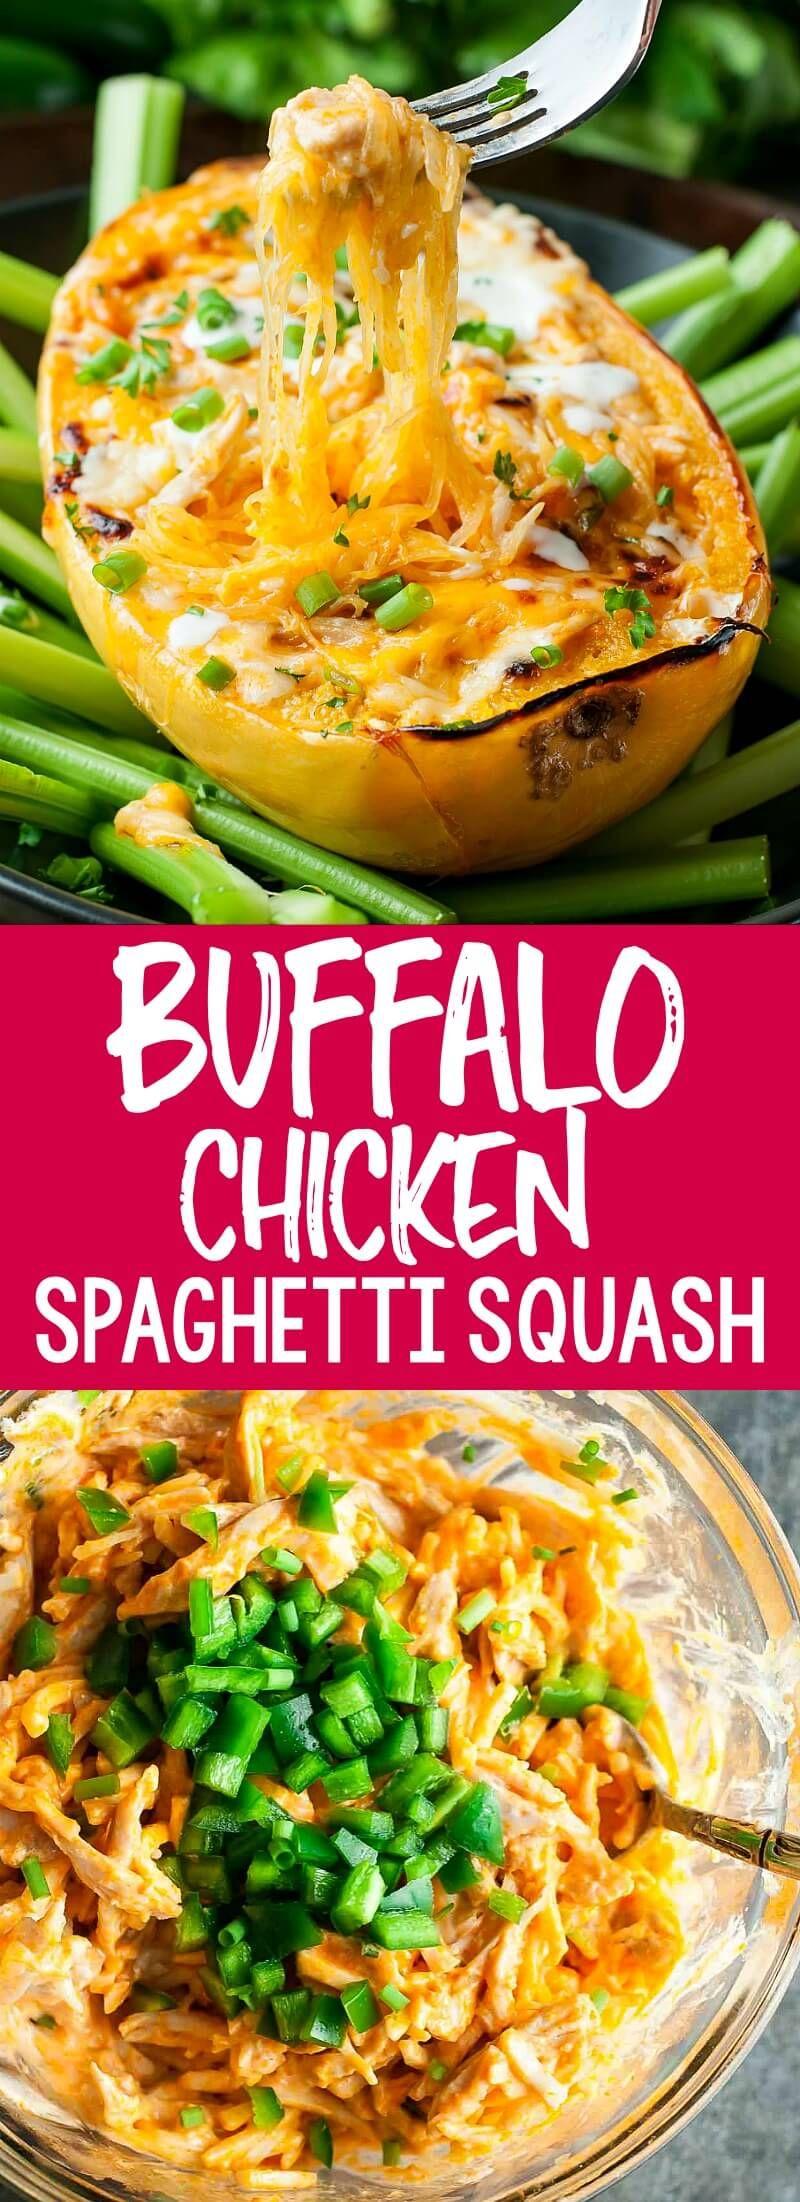 Buffalo Chicken Spaghetti Squash Bowls - Peas and Crayons